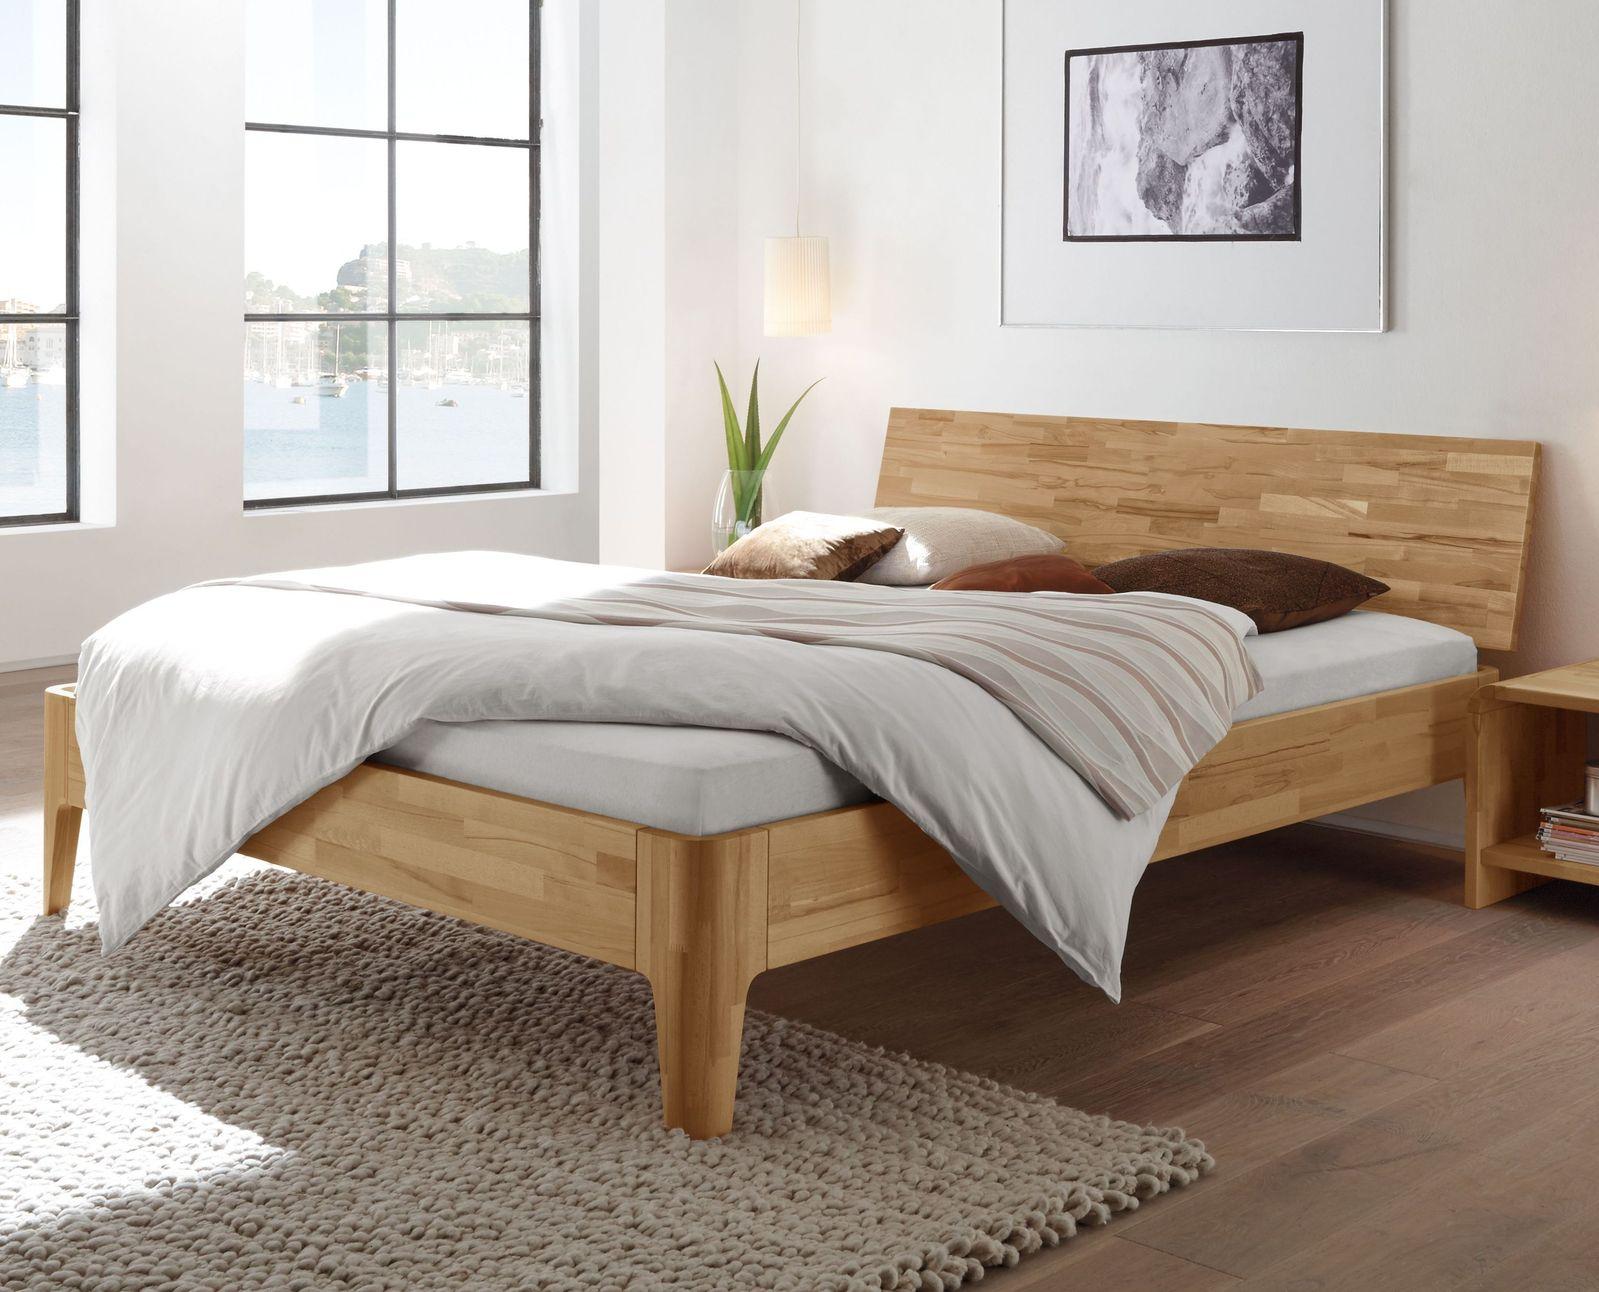 bettgestell in z b 140x200 cm in kernbuche kaufen florina. Black Bedroom Furniture Sets. Home Design Ideas